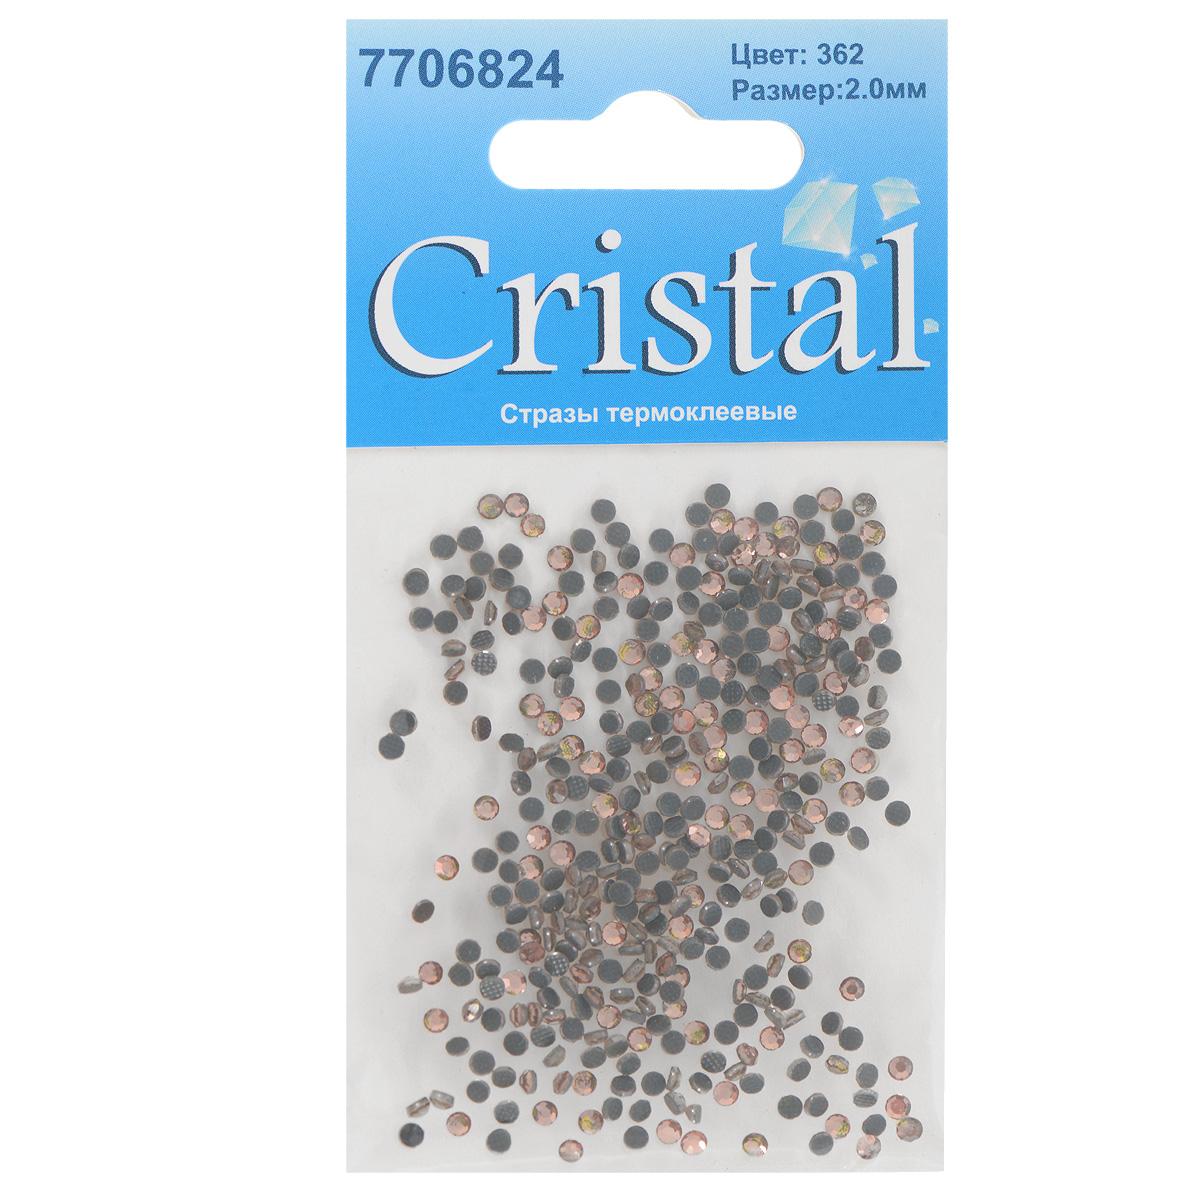 ������ ������������ Cristal, ����: ������-���������� (362), ������� 2 ��, 432 �� - Cristal7706824_362����� ������������ ����� Cristal, ������������� �� ������������������� ������, �������� ��� �������� ������, ���������� ��� ��������. ����� ������ ����� ������� ��� � ������� ����������� � �������. ��� ������������ ����� ��� ���������� ������ �����, ������� ��� ������������ ������� ���������� �������� ���������, ������������, ����� �������, � ��������� �����������. ���� ����� �� ���������� � ����������� ��������������: ������ ������������ � ����� � ������������ ������ � �������� �������. ����� ����� ������������ ����������� ��������. ��������� �������� ������� ������� ����� ���� ������������ � ������������. ������� �����: 2 ��.